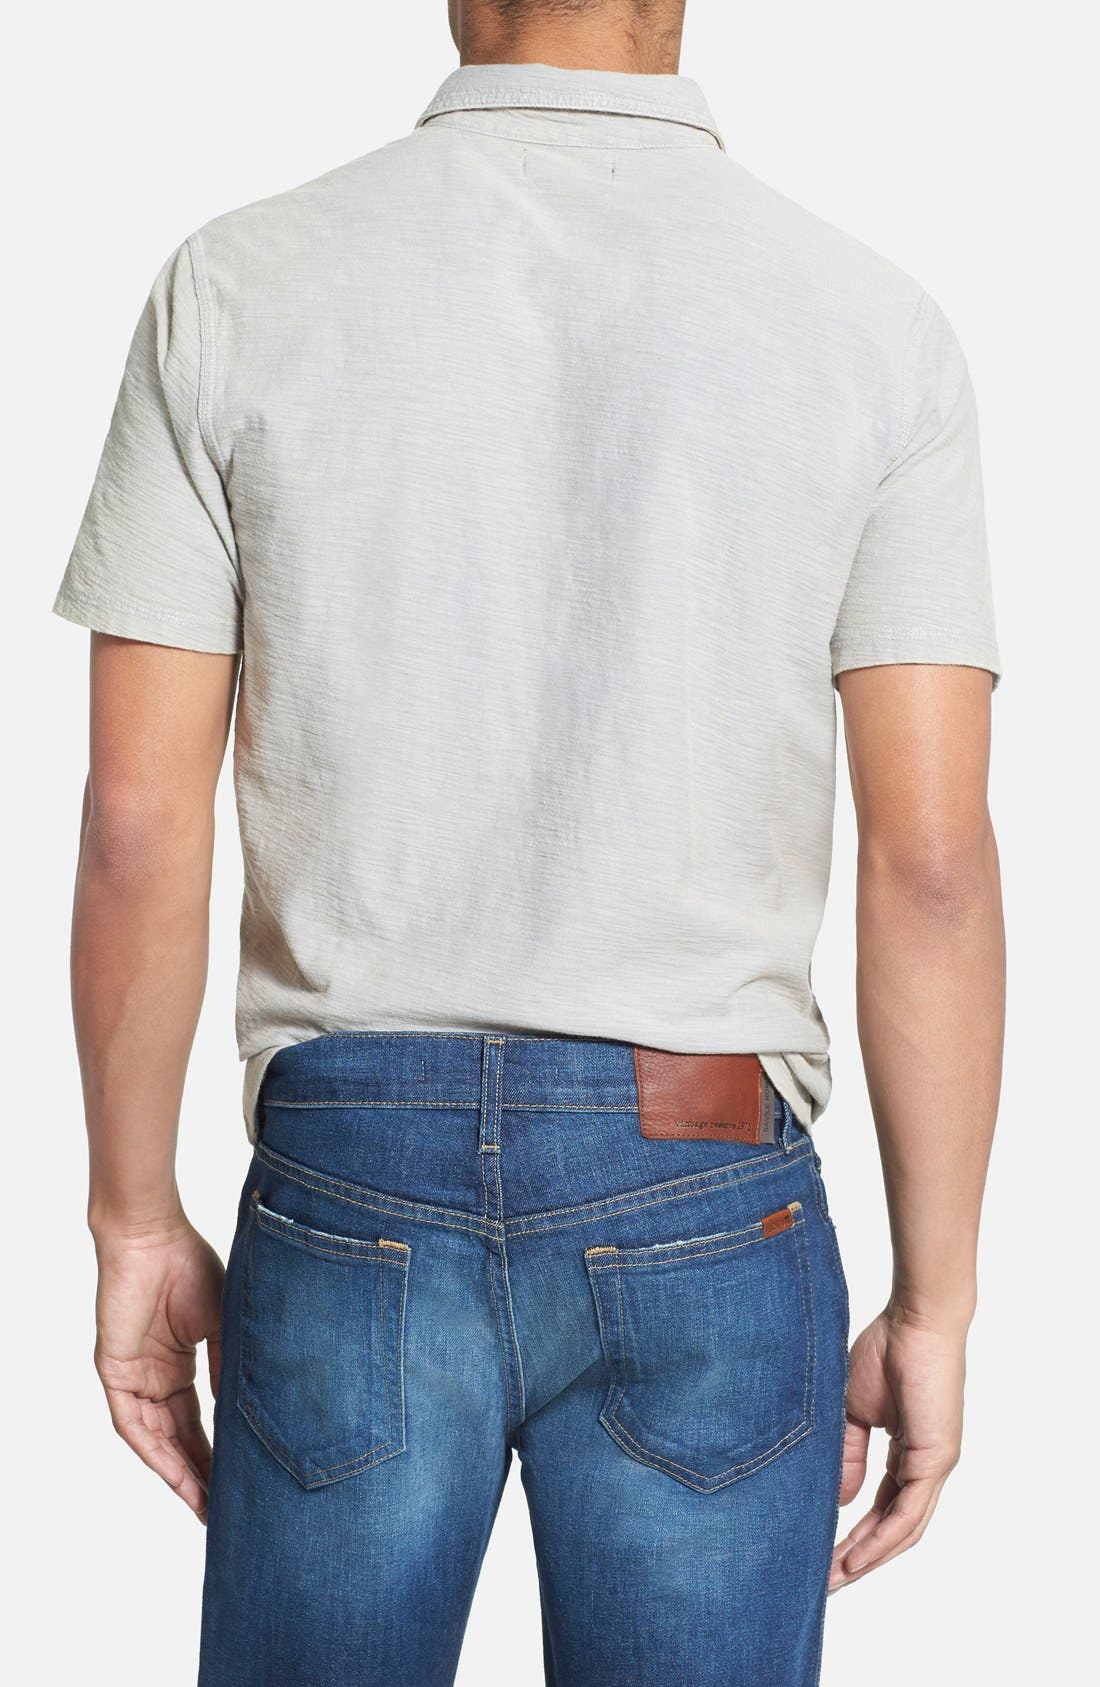 WALLIN & BROS., 'Workwear' Short Sleeve Polo, Alternate thumbnail 2, color, 030